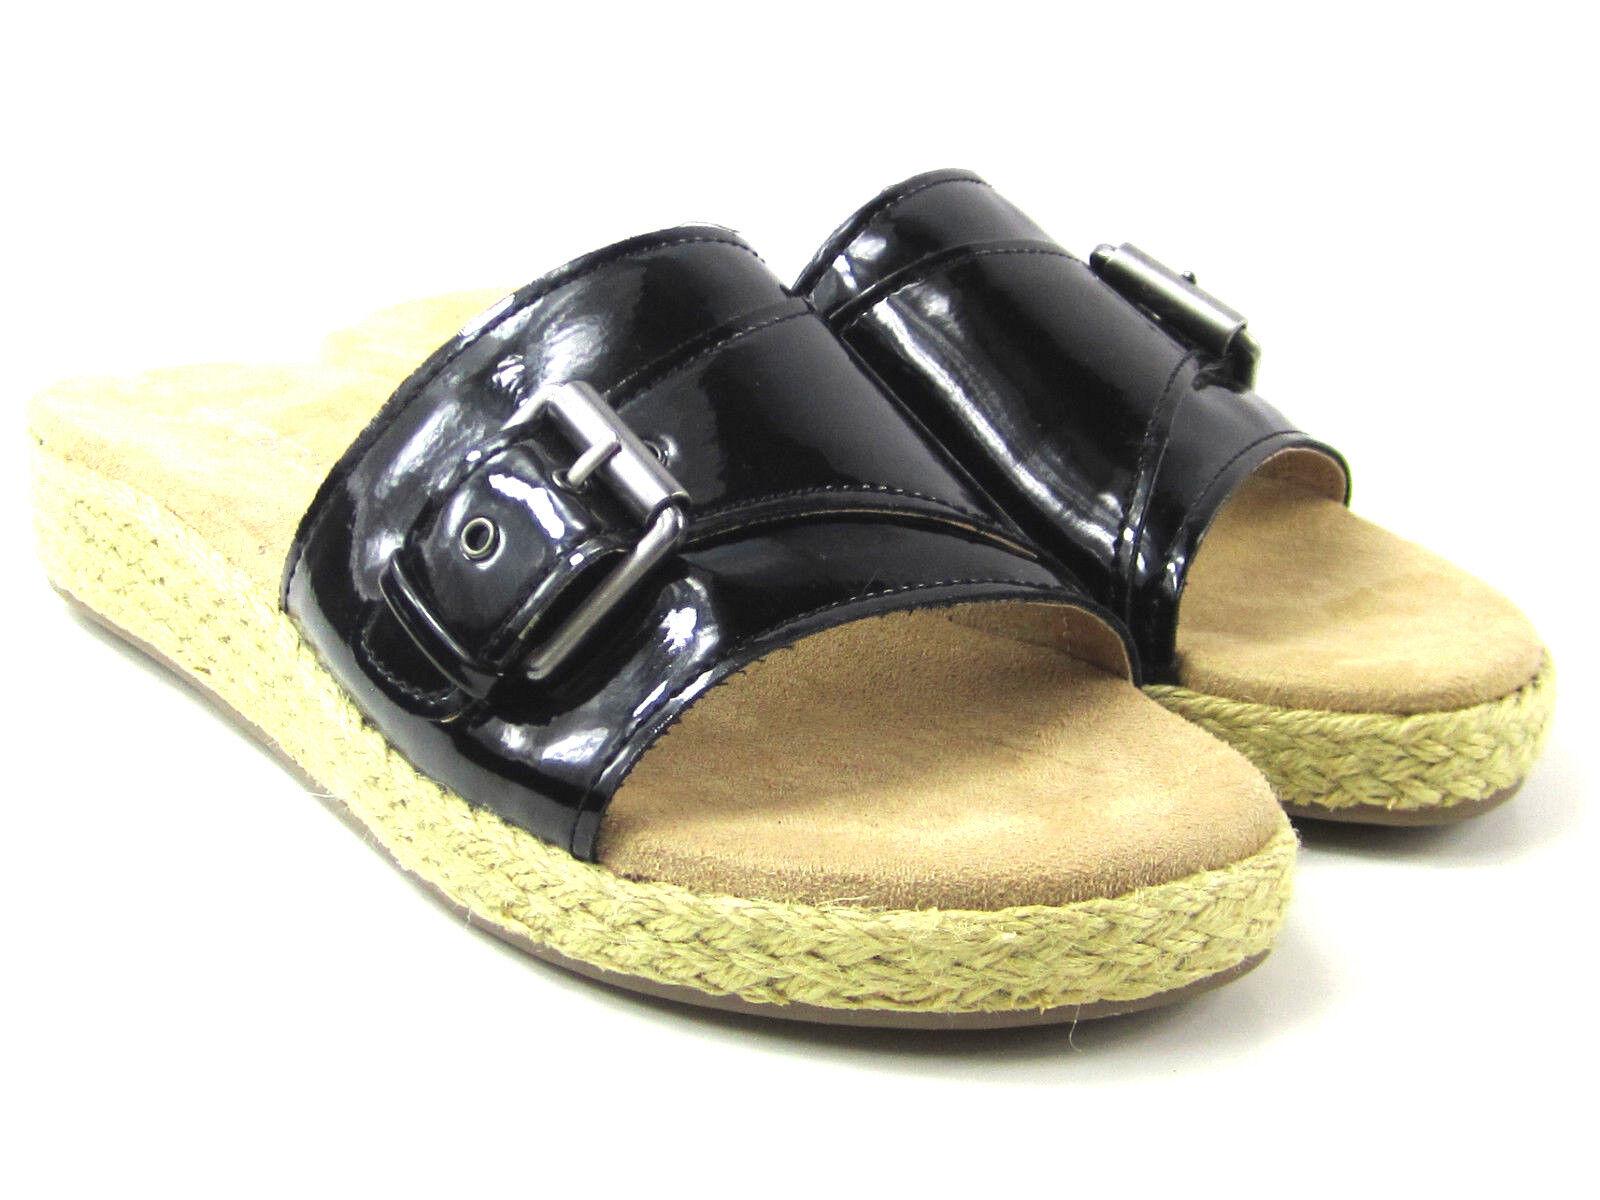 Aerosoles Glorify Espadrille Platform Sandal Black Faux Patent Women's Size 9m